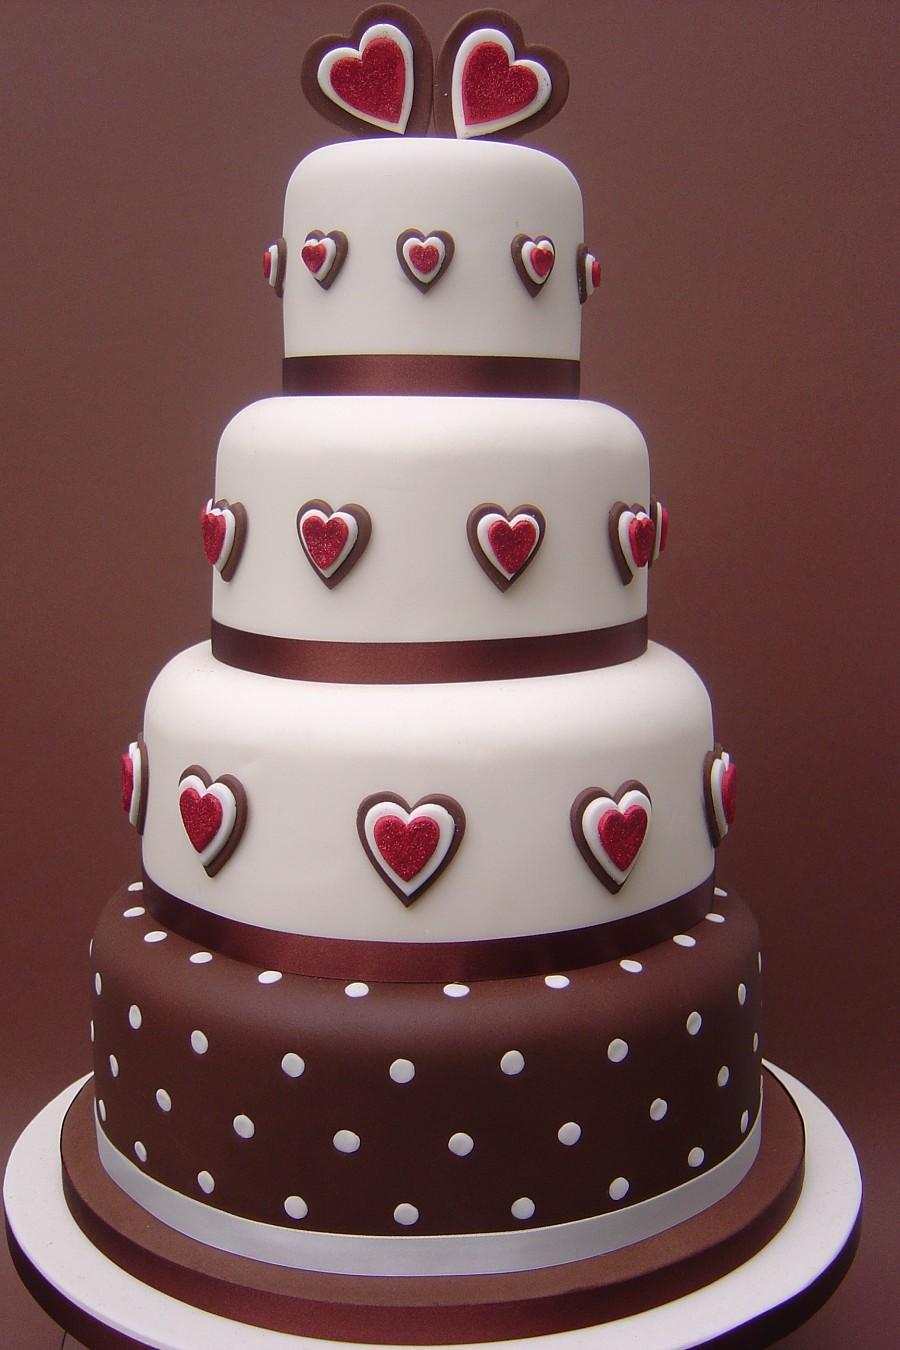 Chocolate Love Cake Images : CAKE SHOP: Wedding Cake